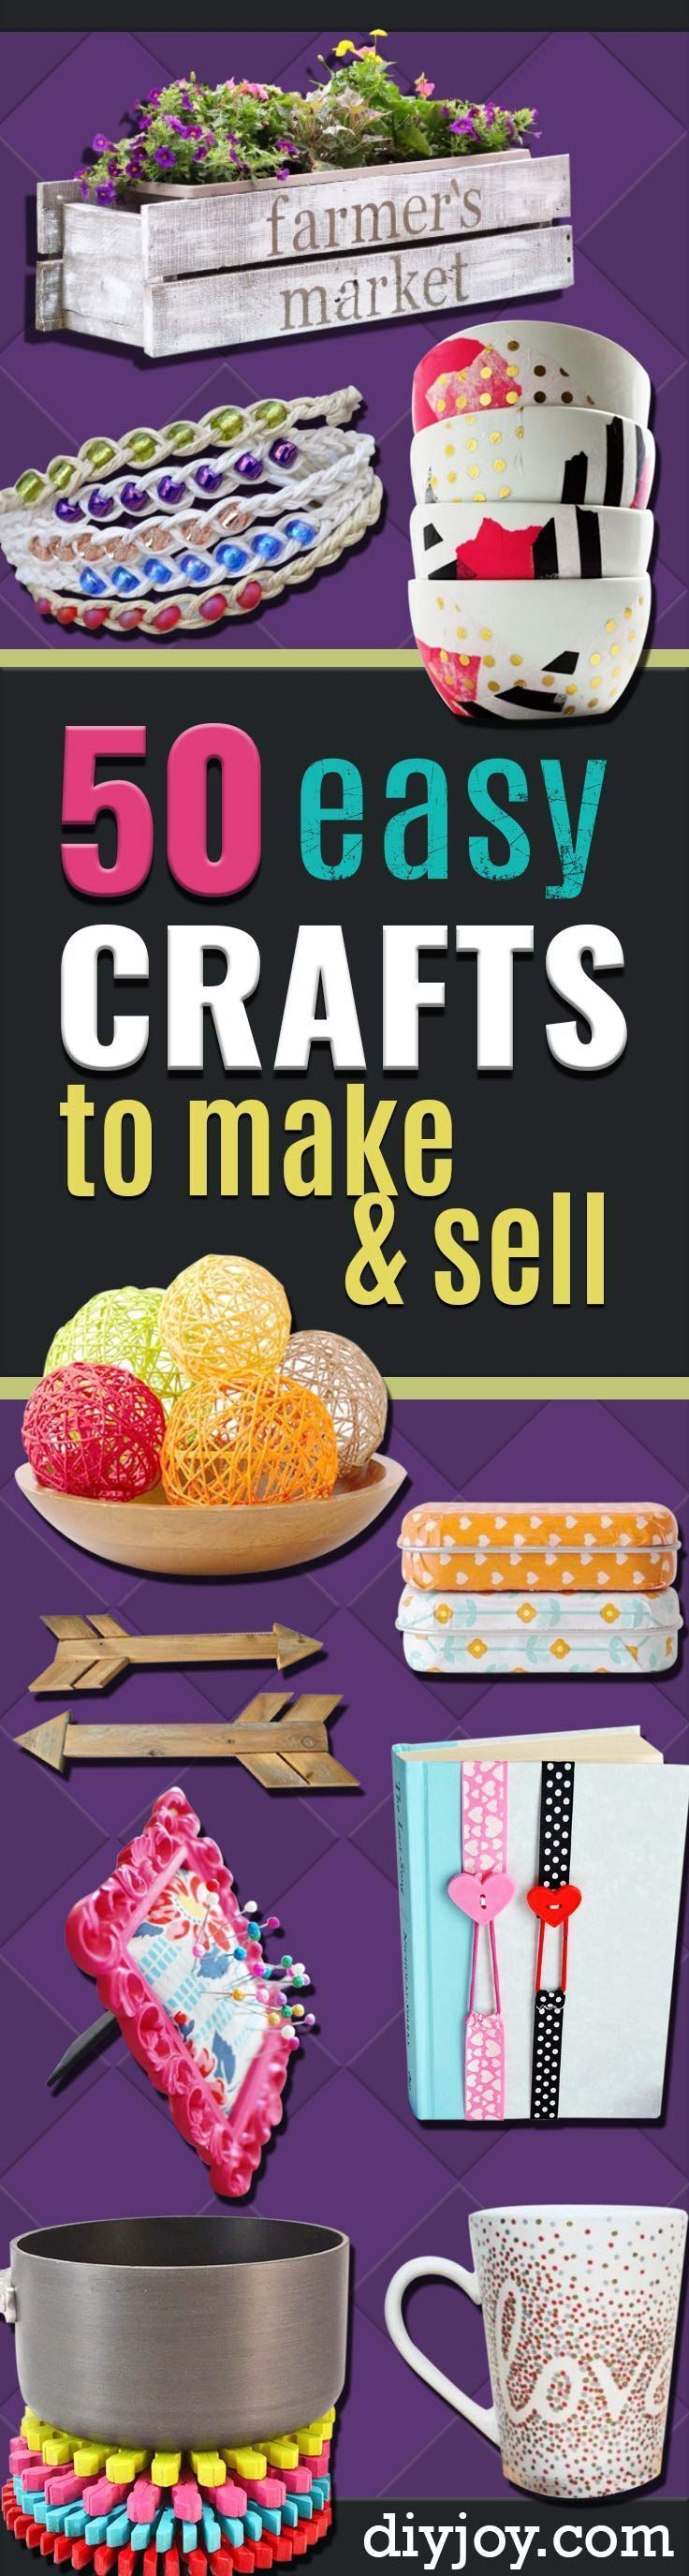 best crafts images on pinterest crafts for kids creative